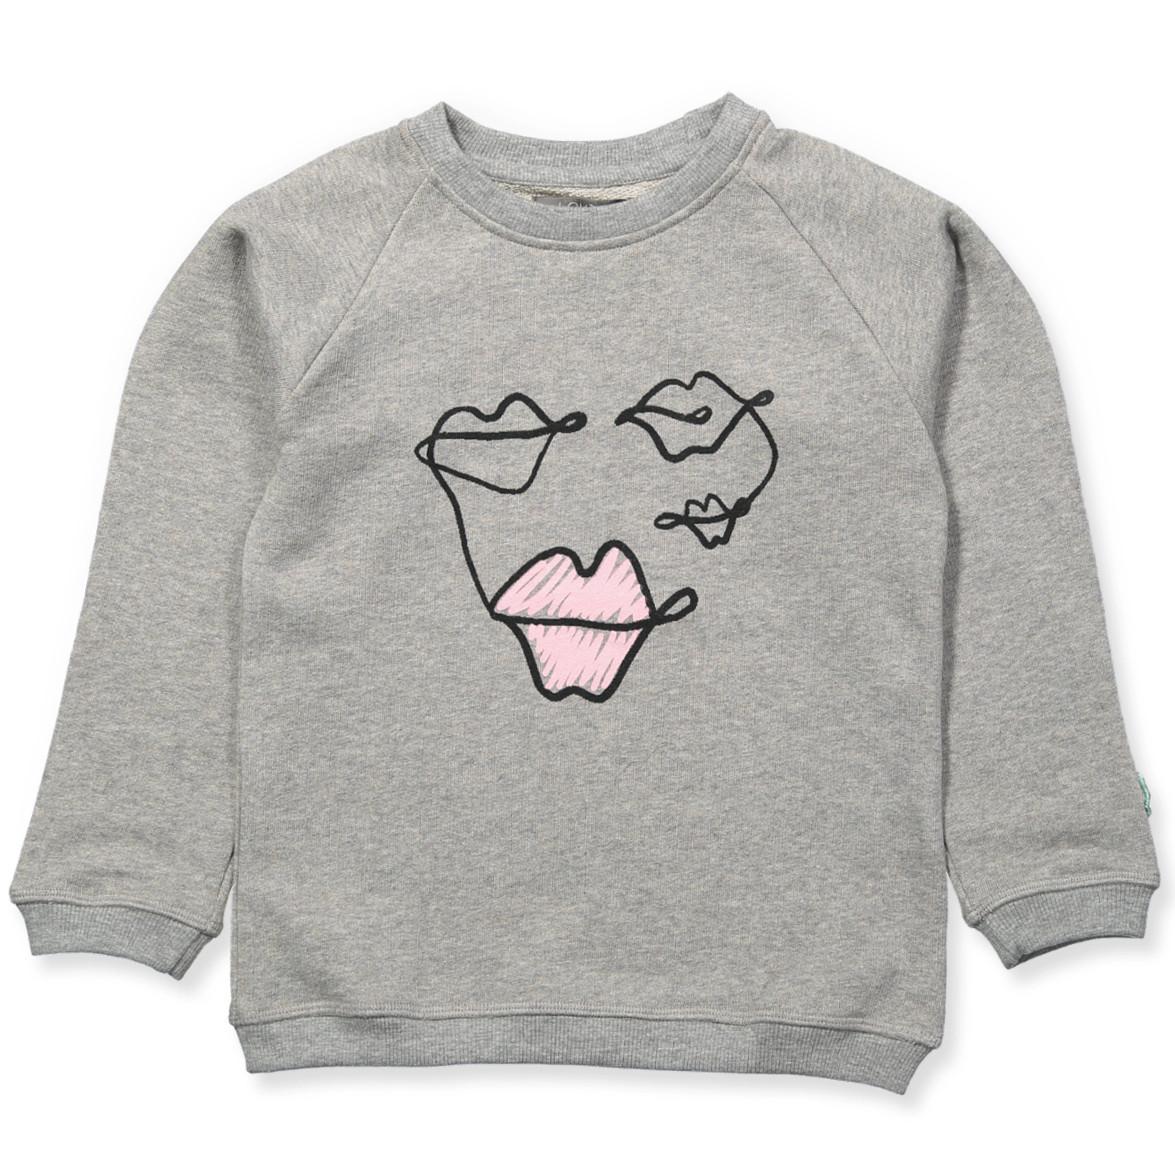 Nova øko sweatshirt